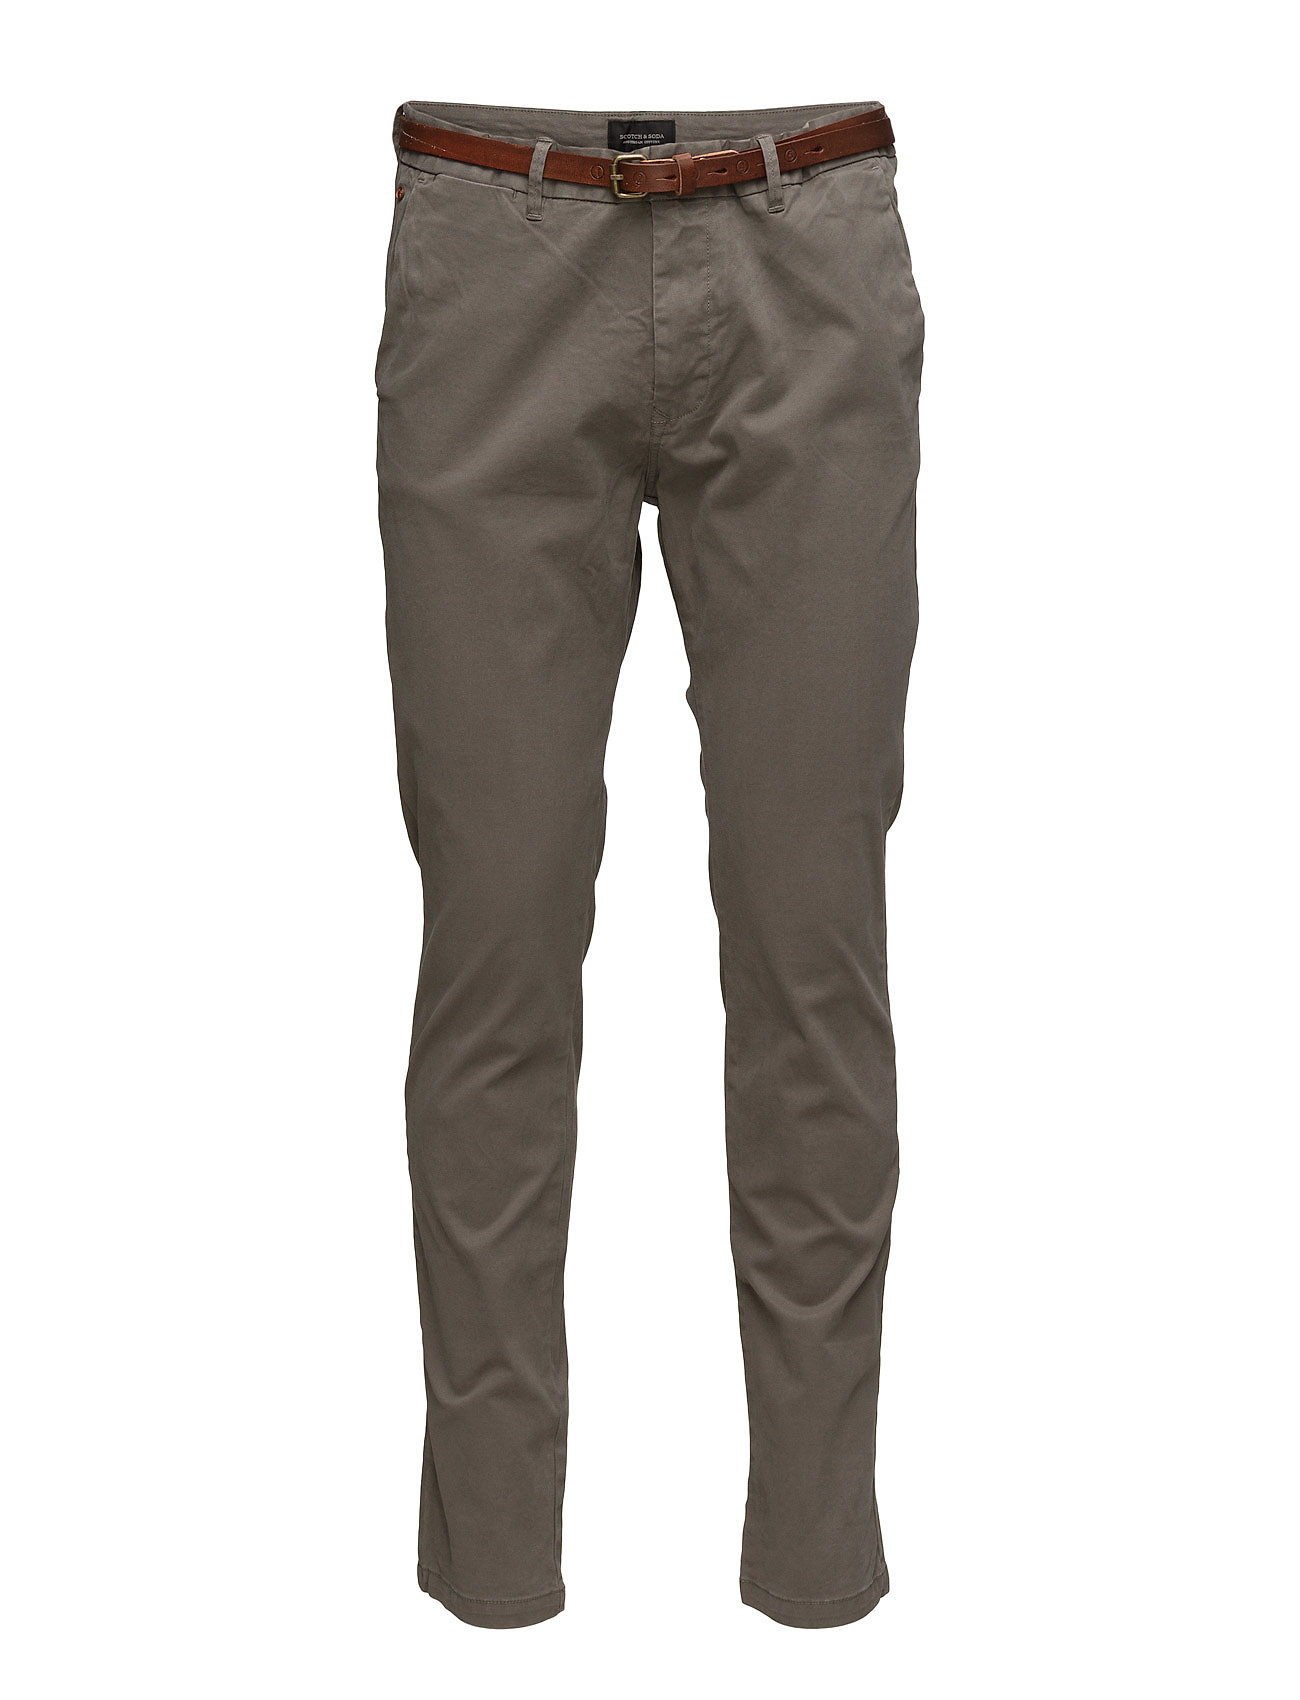 Dyed elastan Garment Chino Slim Cotton Soda PantgreyScotchamp; Fit oQWrxedCB